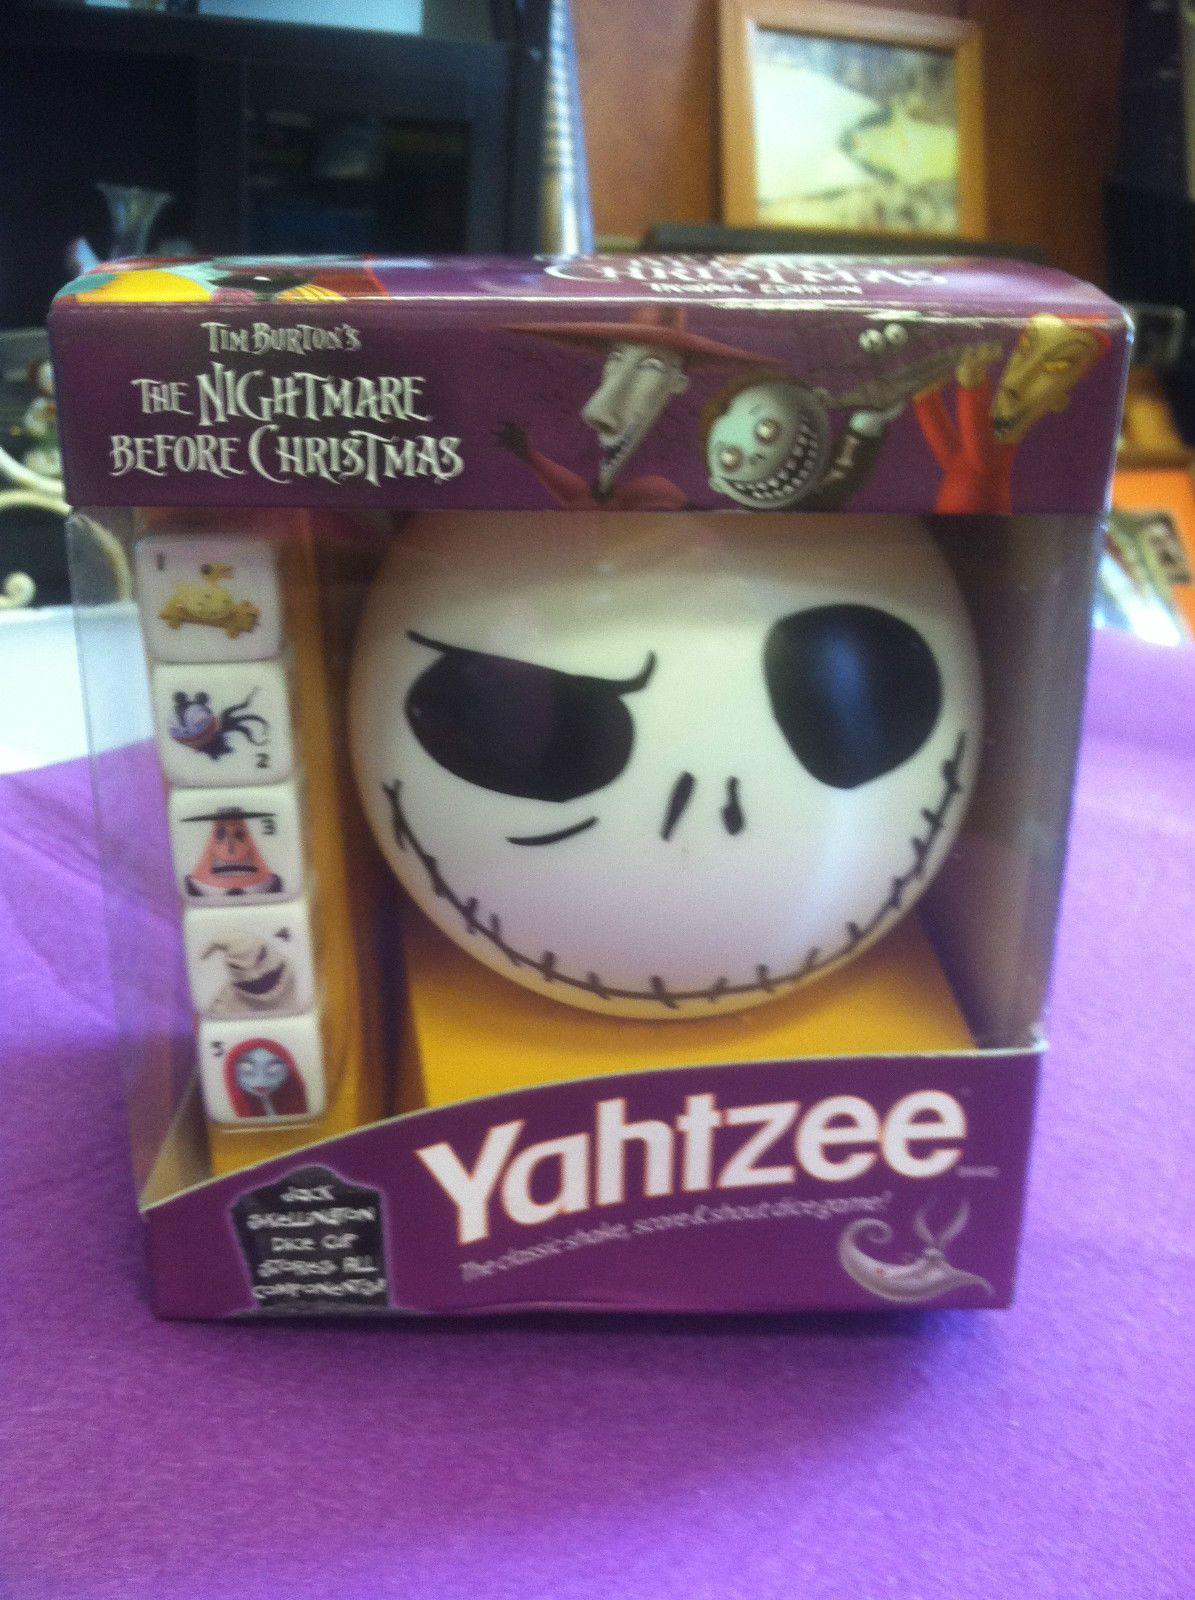 Yahtzee Tim Burton\'s The Nightmare Before Christmas Dice Game Brand ...